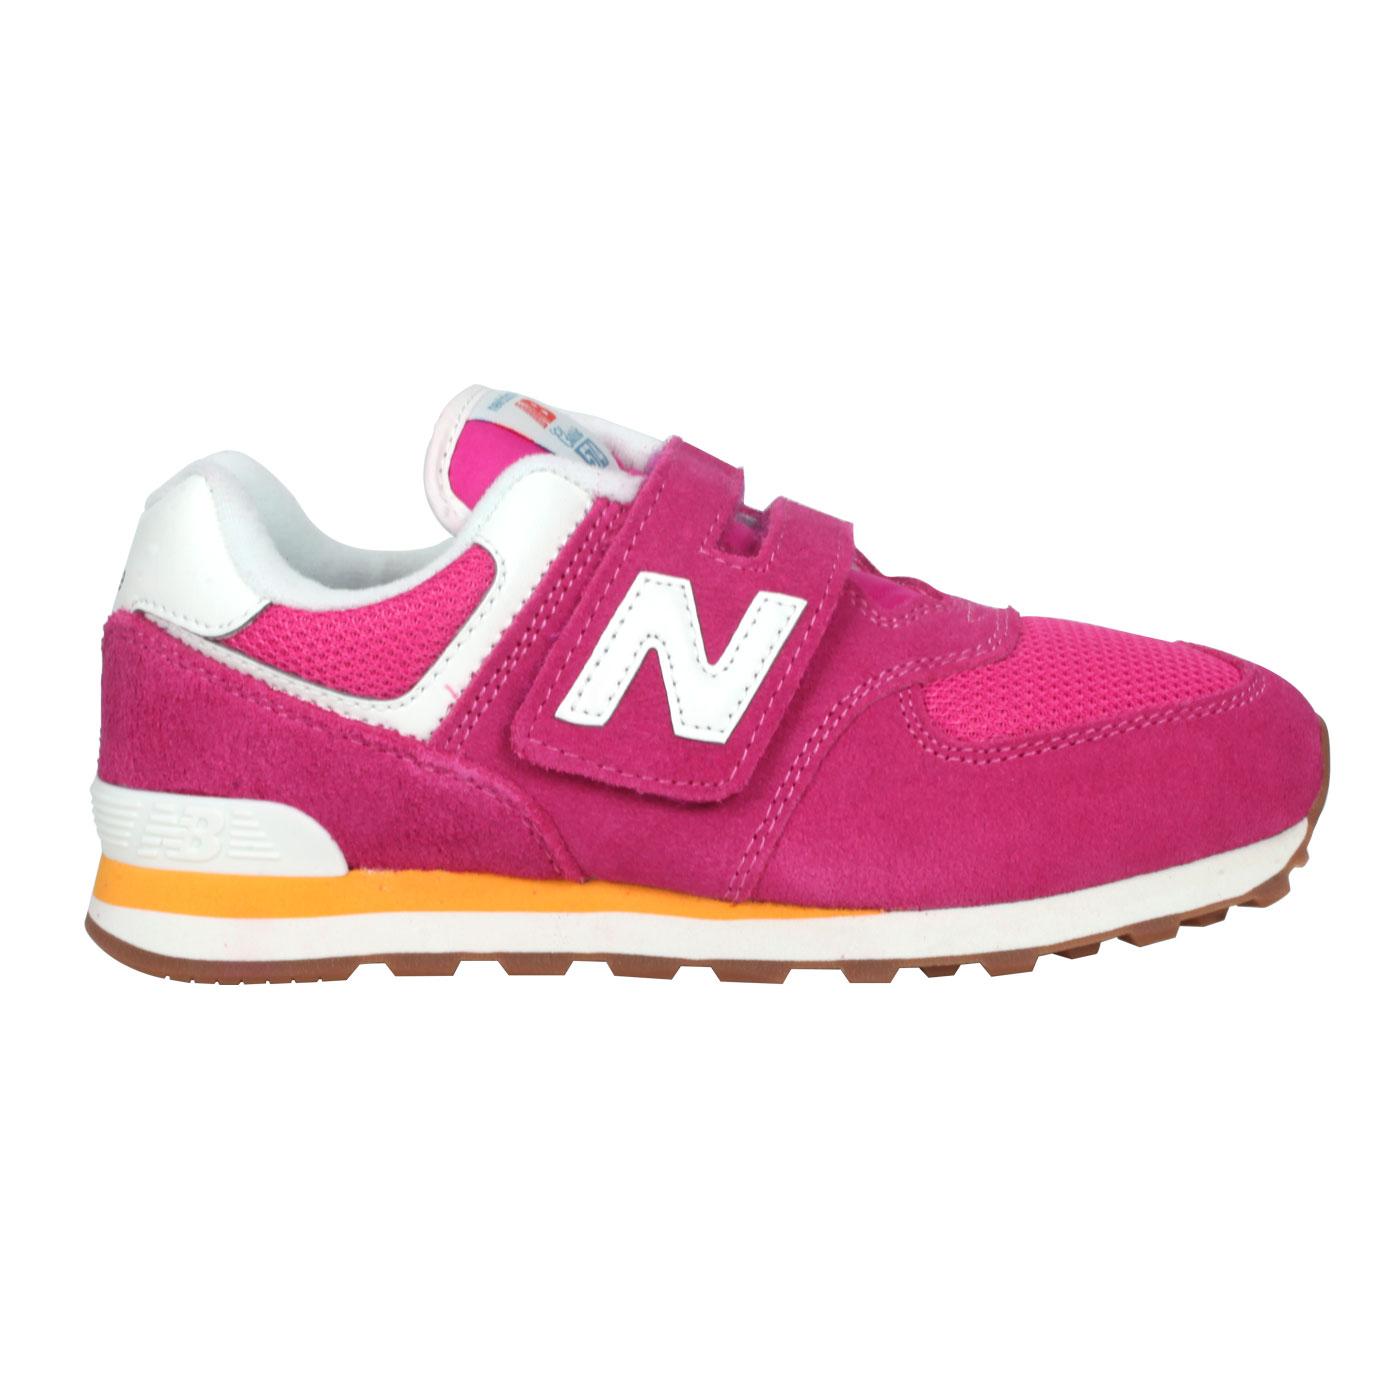 NEW BALANCE 中童休閒運動鞋-WIDE PV574HP2